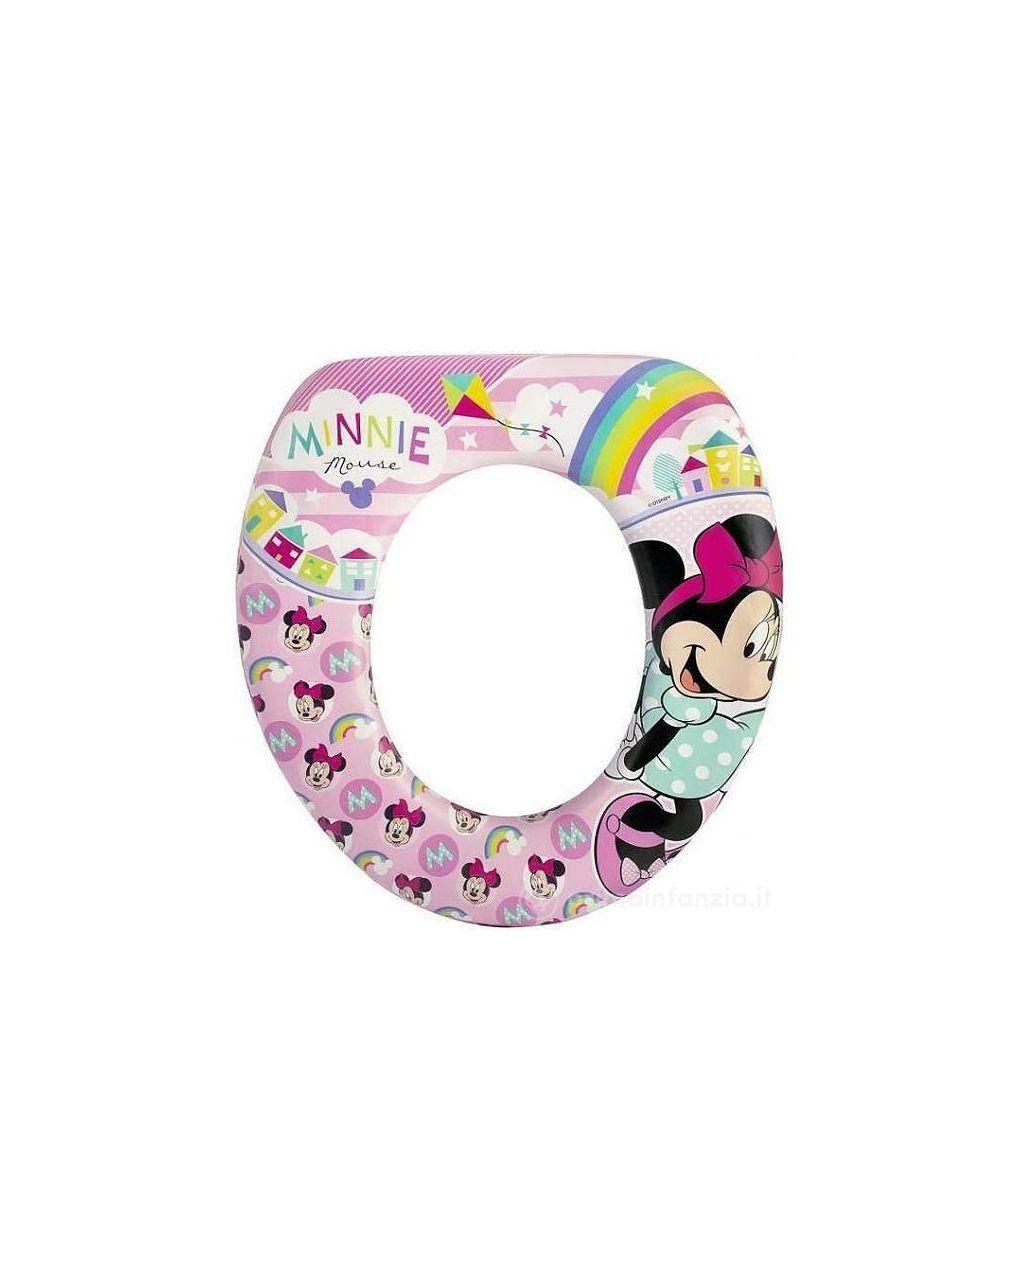 Riduttore wc soft minnie simply - Lulabi Disney, Lullabi